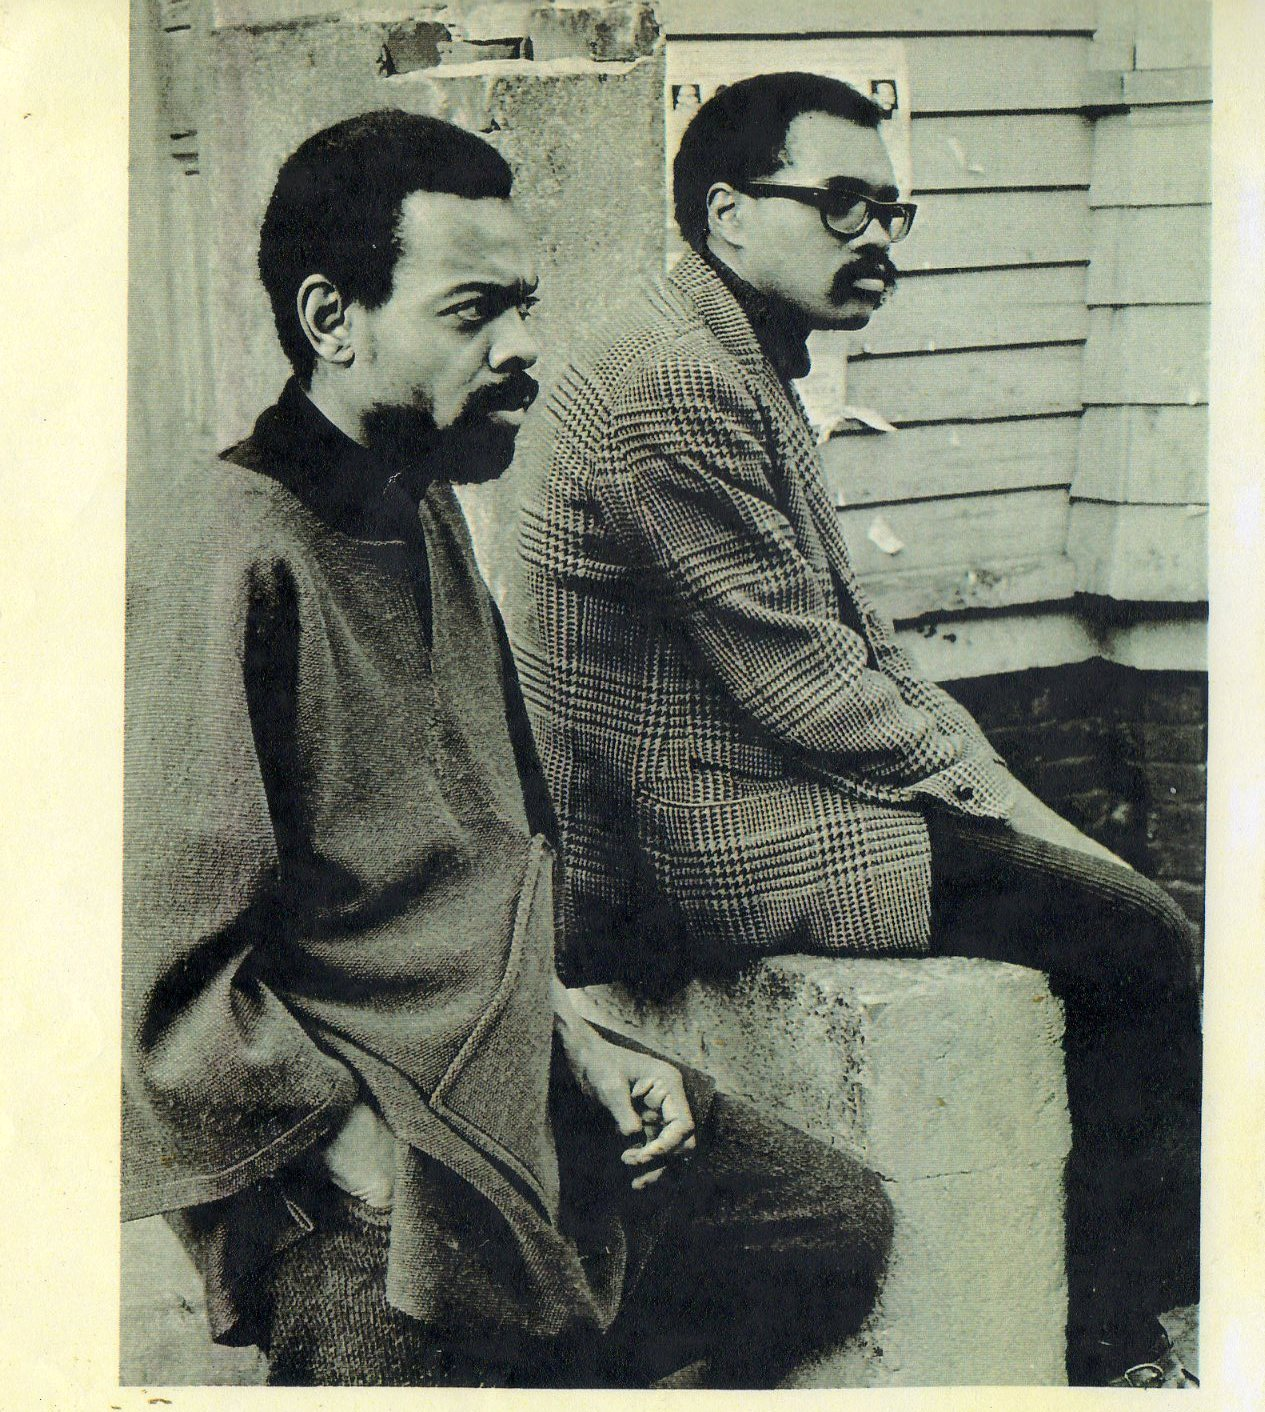 Amiri Baraka and Larry Neal